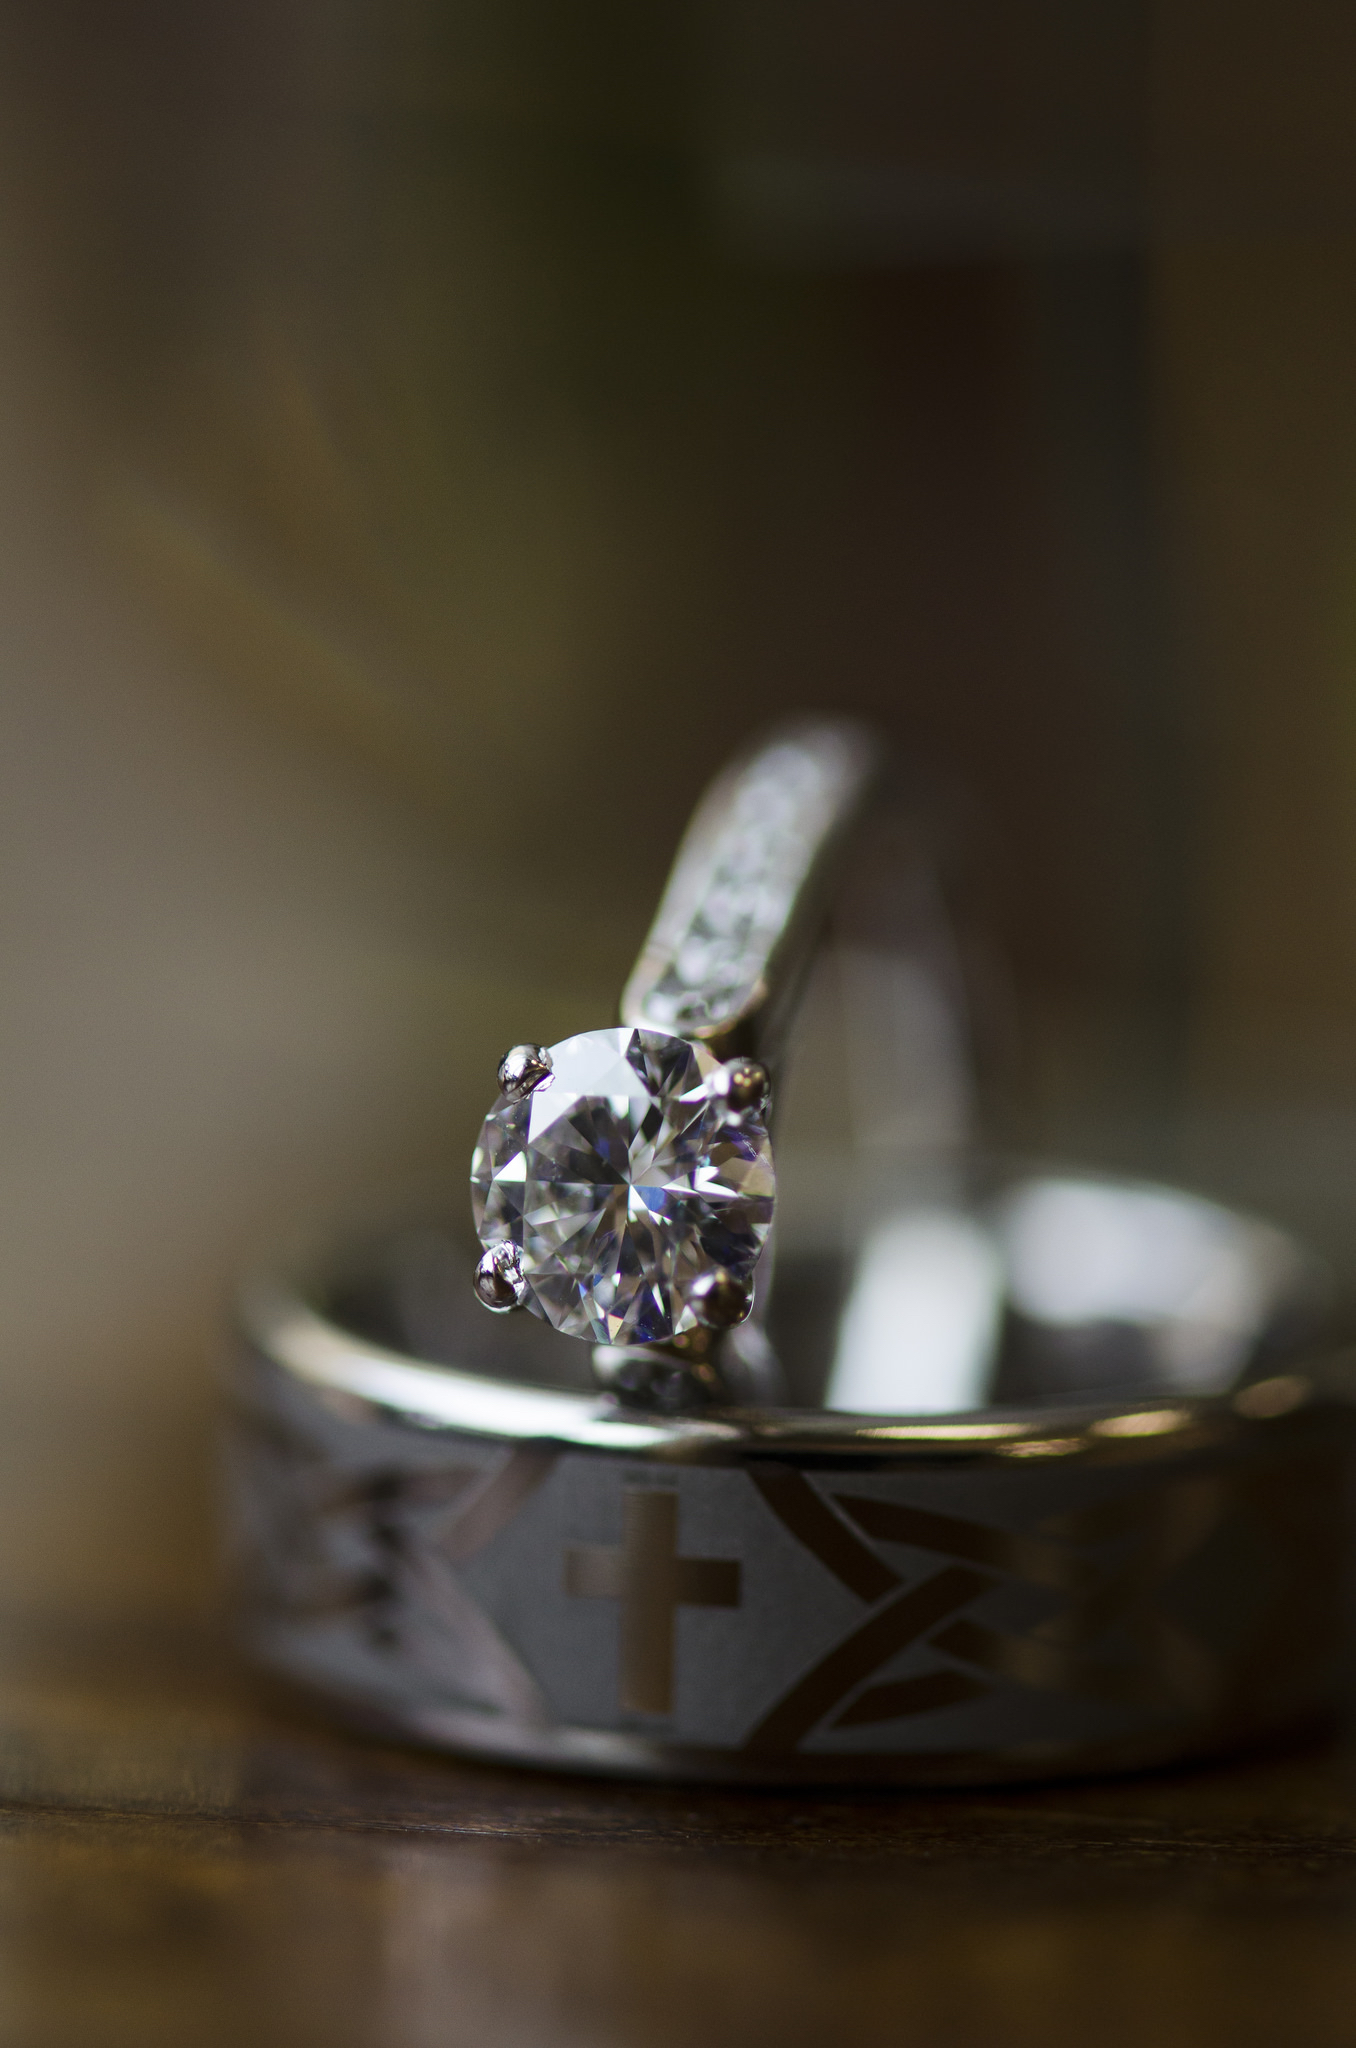 kristine_wedding_rings_spiritedtable_photo08.jpg